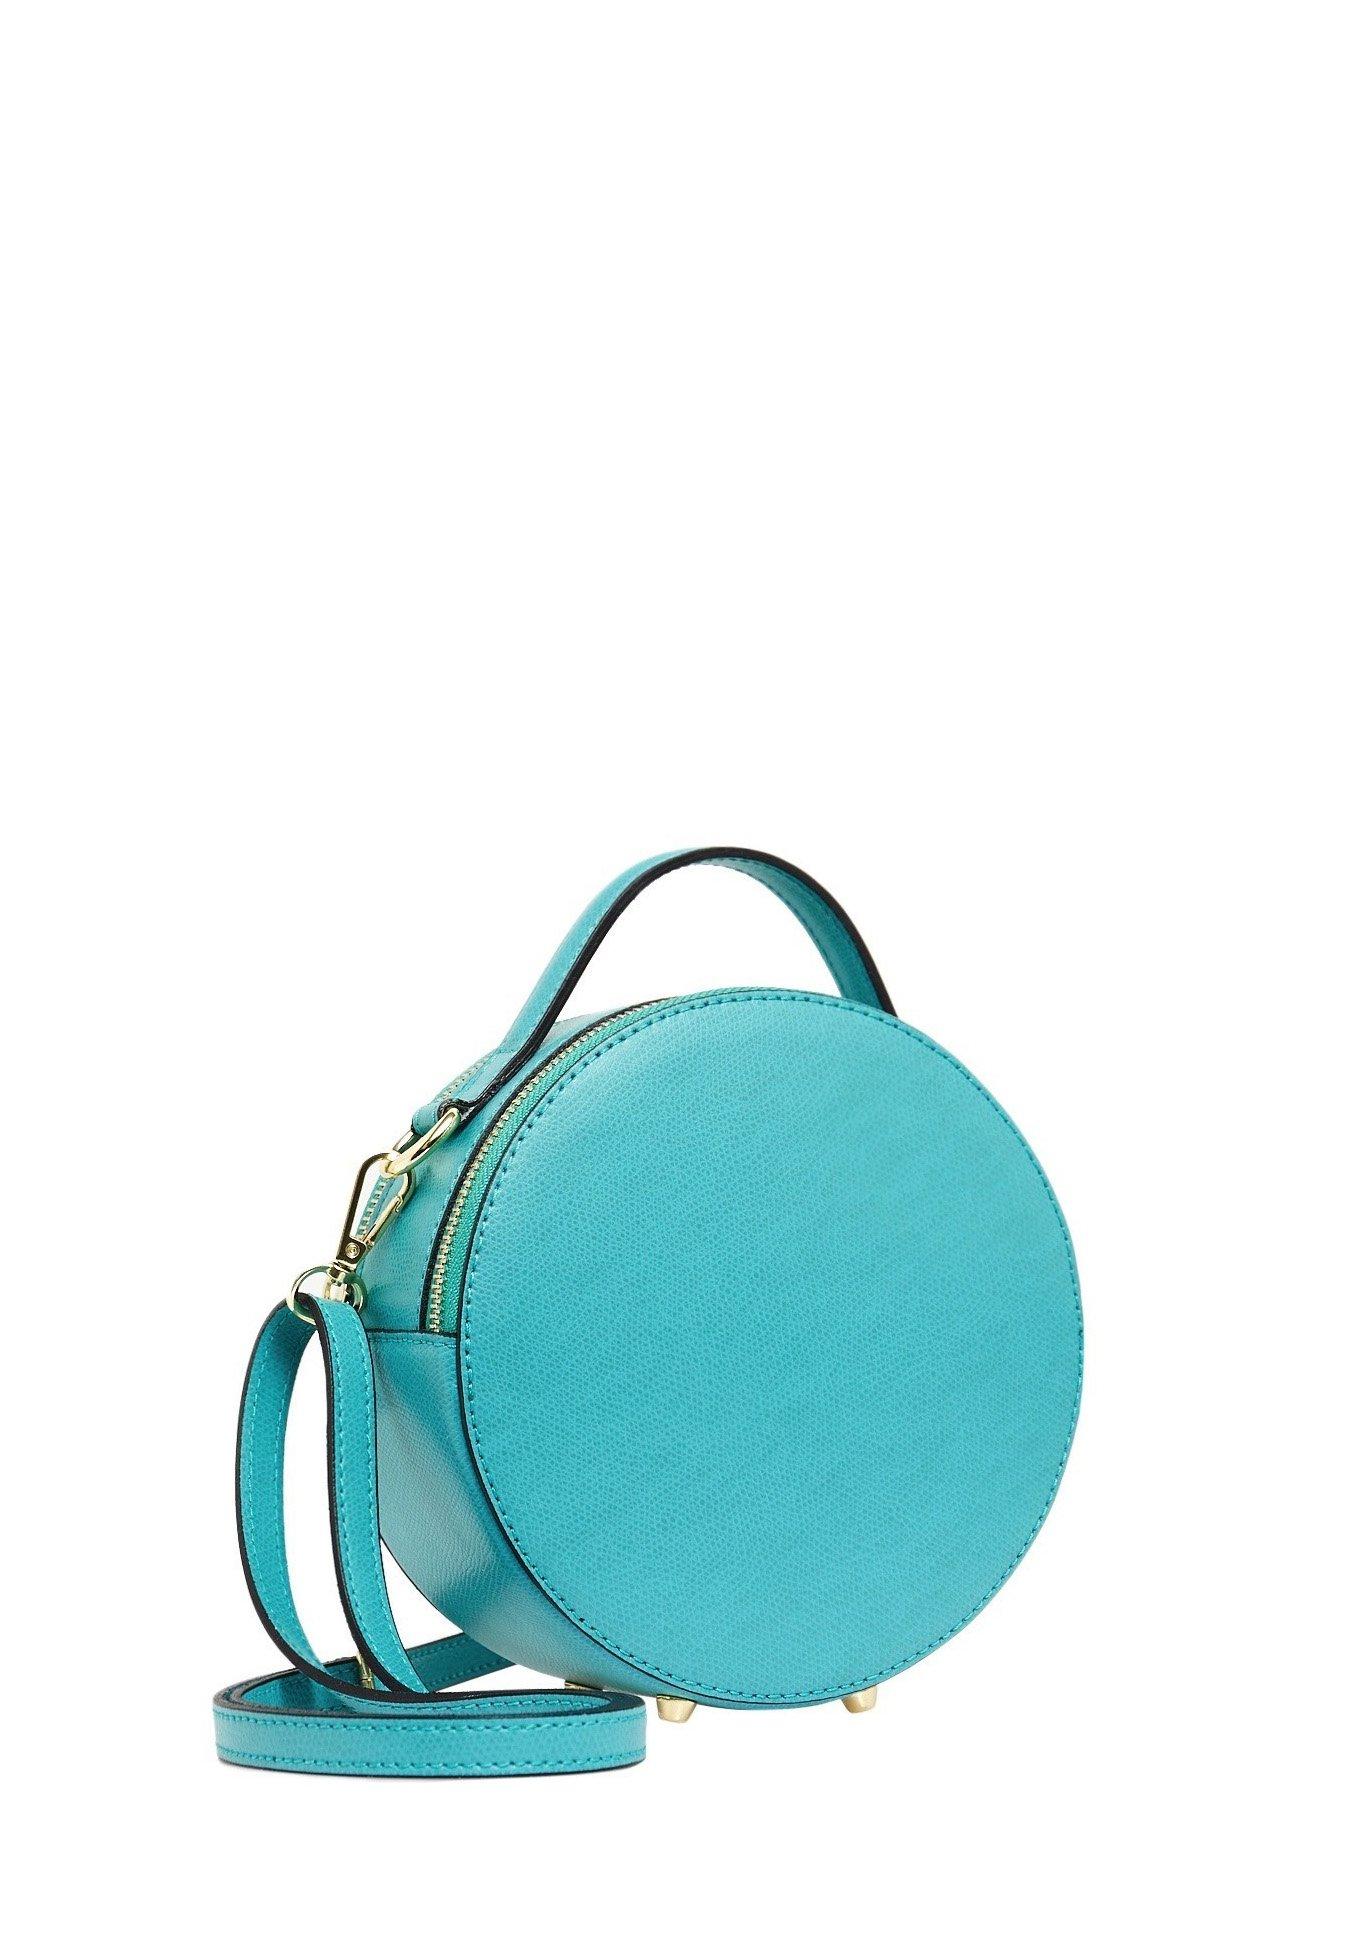 Felipa Sac Bandoulière - Turquoise ieeW0Uz